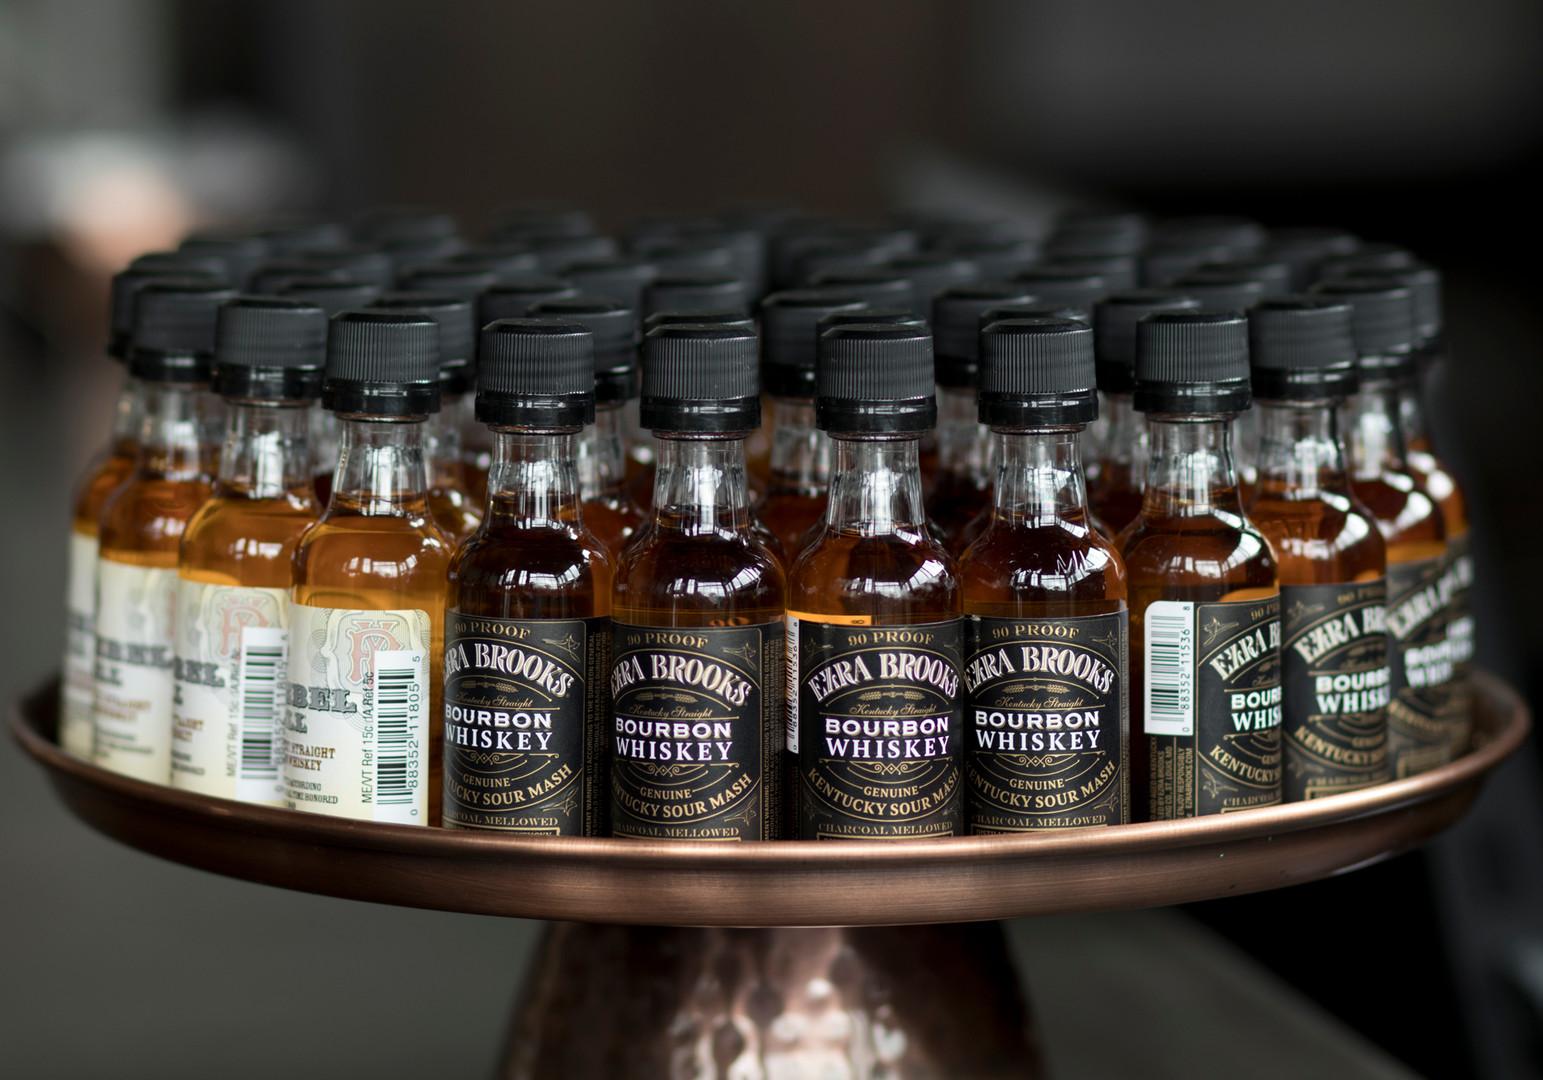 Lux Row Bourbon